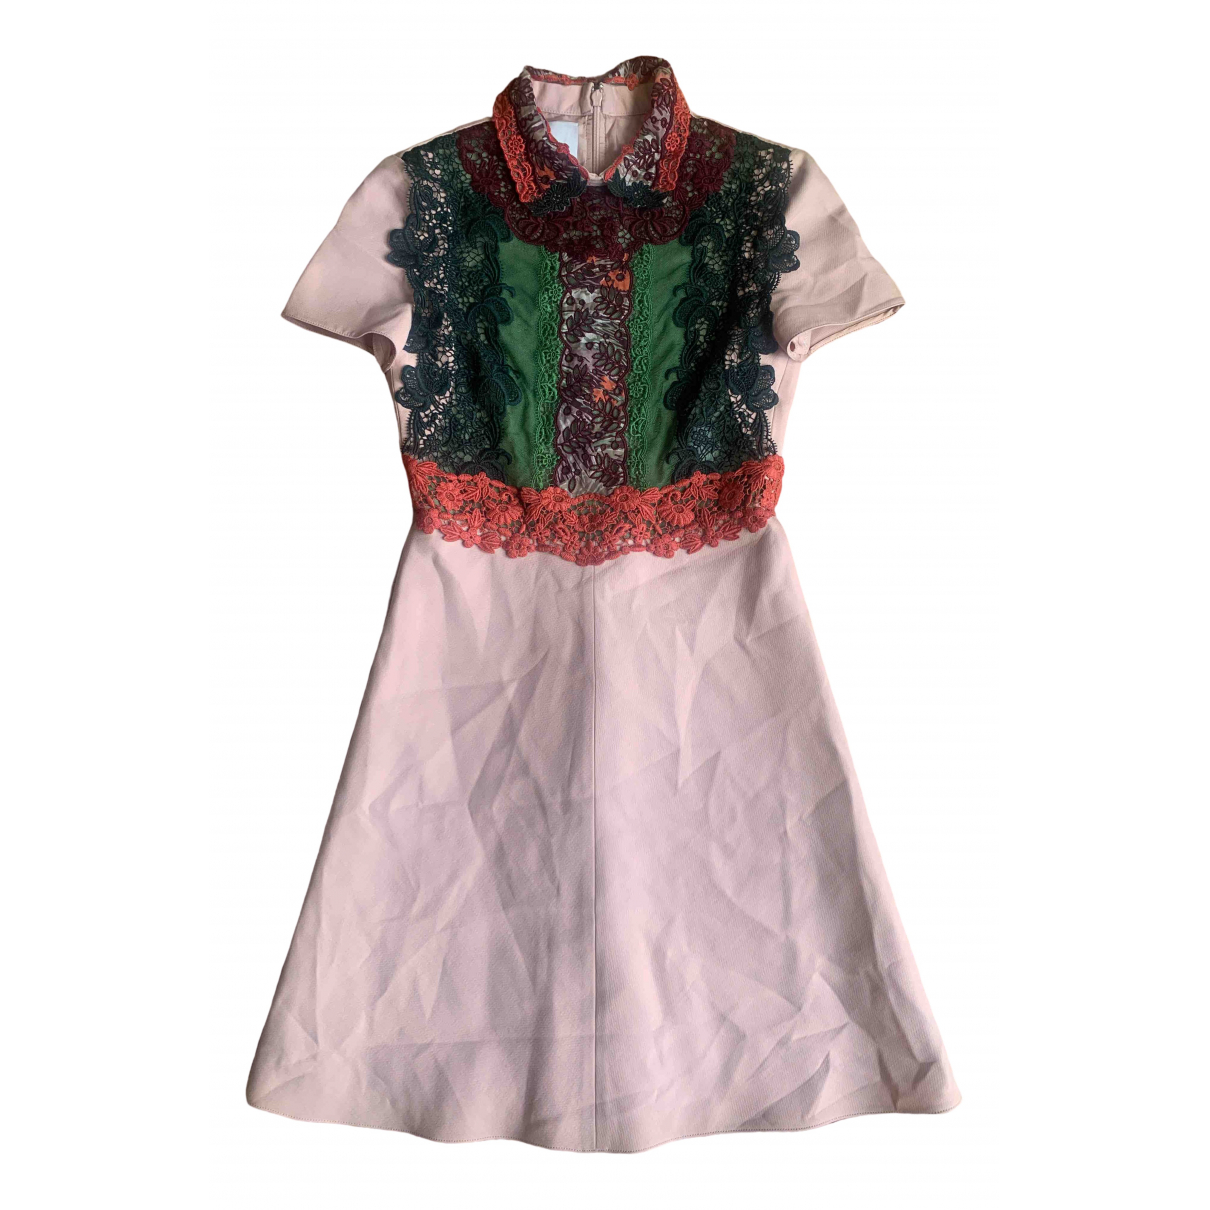 Valentino Garavani \N Kleid in  Bunt Wolle